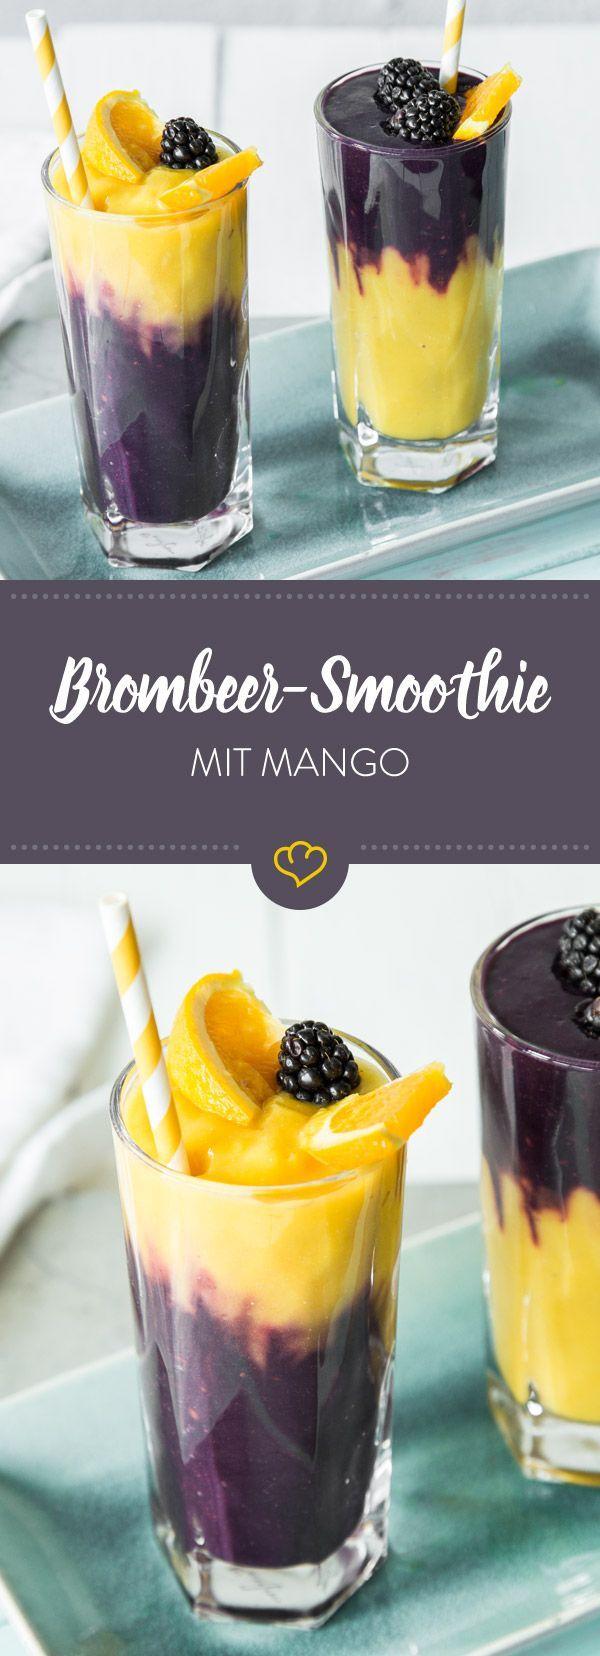 Photo of Hawaiian blackberry and mango smoothie